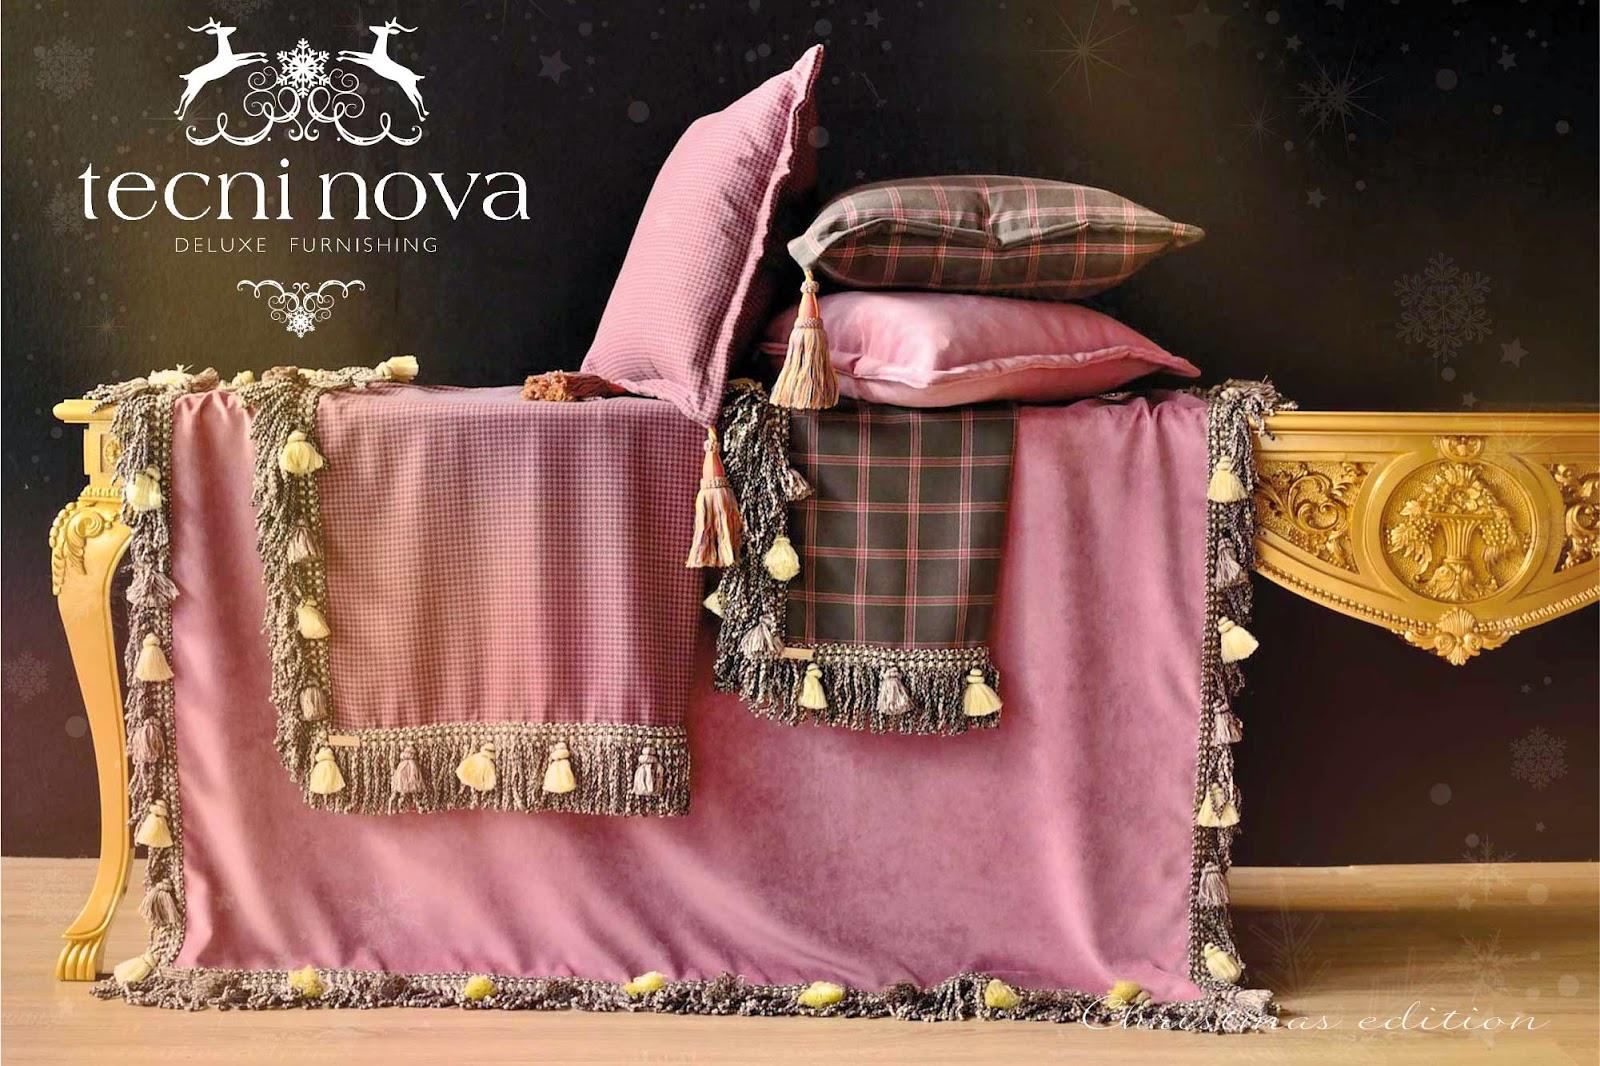 luxury-gift-home-decor-sophisticated-warm-quality-christmas-gift-deluxe-furnishing-accesoires-plaid-cushion-regalo-de-lujo-especial-original-exigente-calidad-decoración-accesorios-navidad-teninova-deluxe-furnishing-classic-style-clasico-atemporal